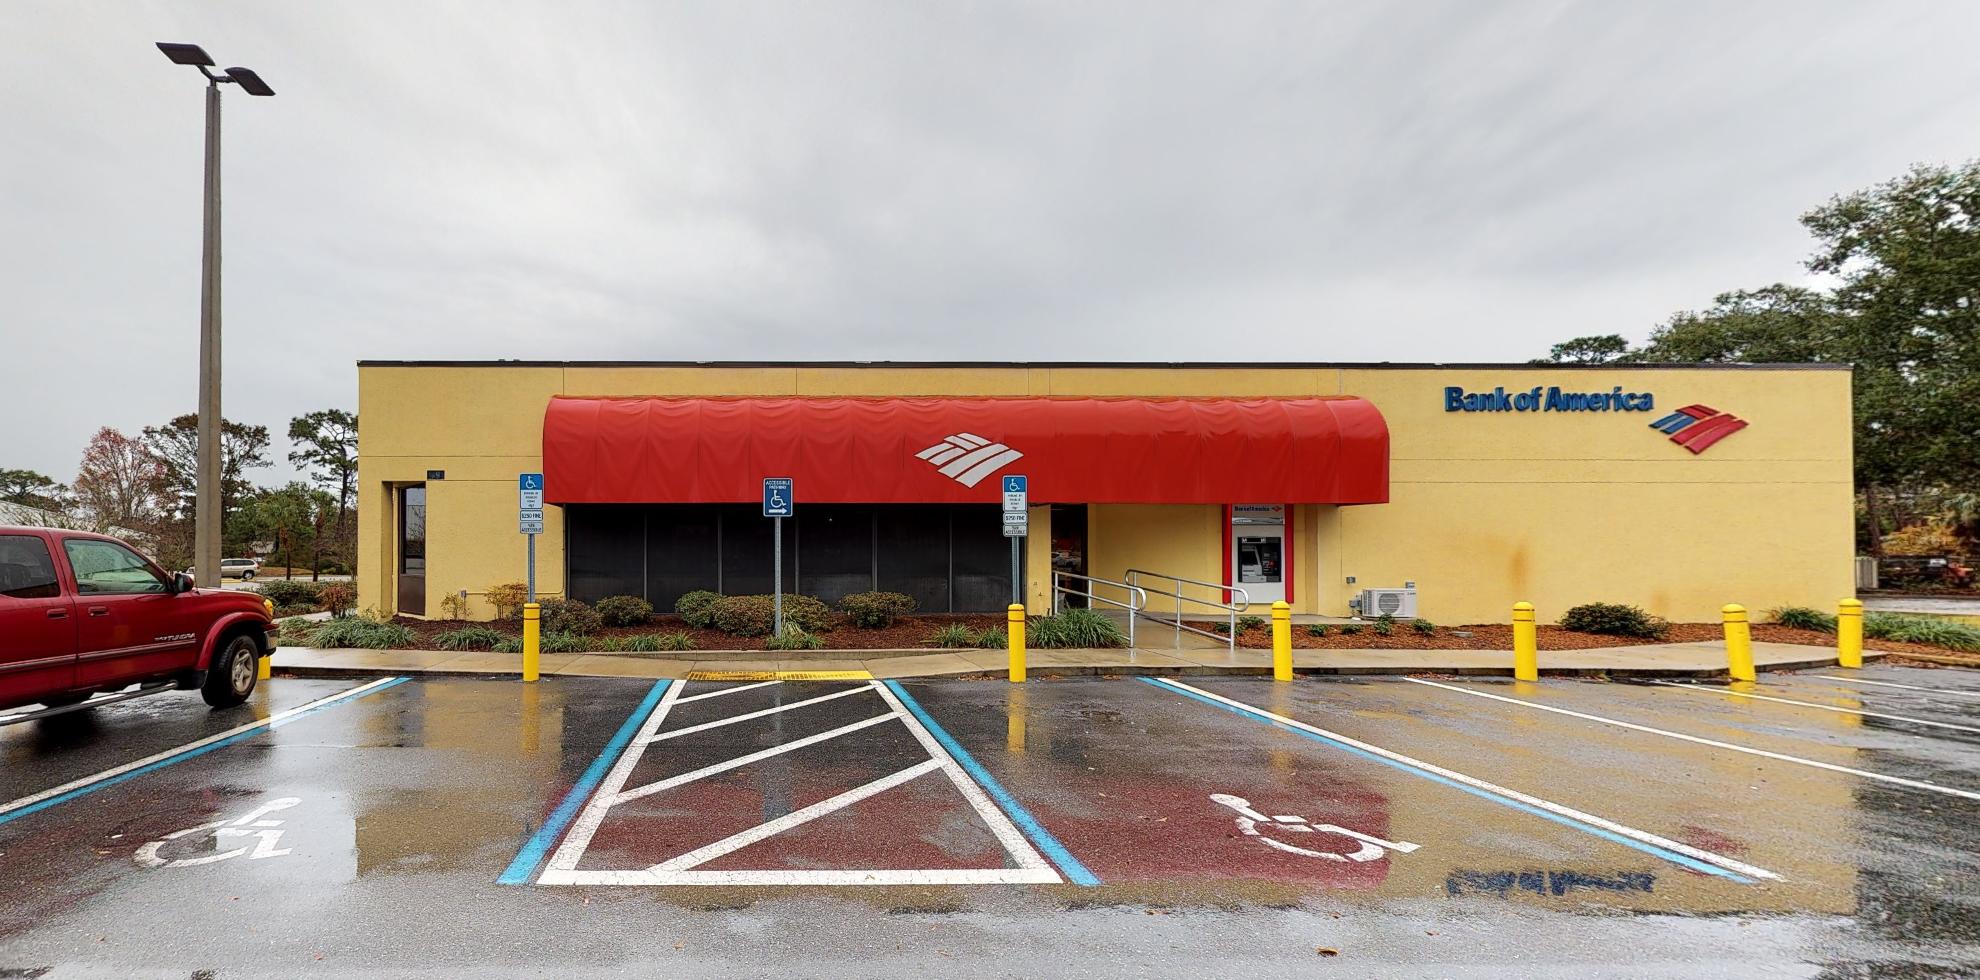 Bank of America financial center with drive-thru ATM | 4395 S Suncoast Blvd, Homosassa, FL 34446